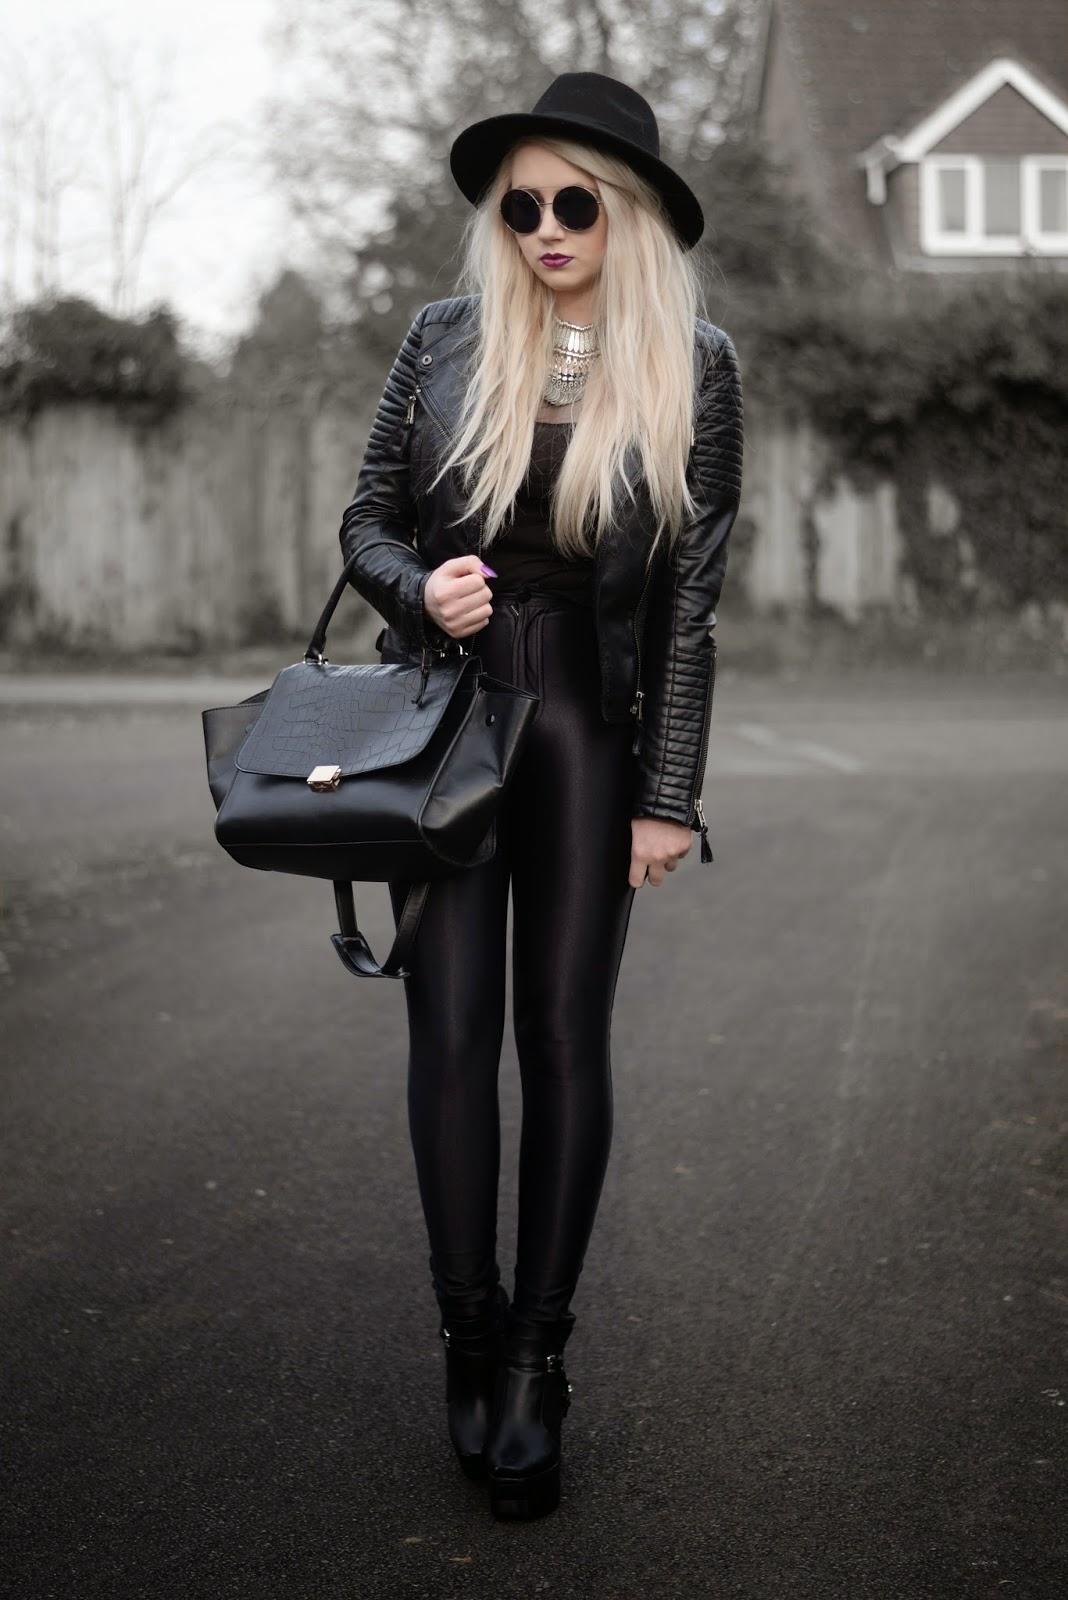 Sammi Jackson - Yetti Coat